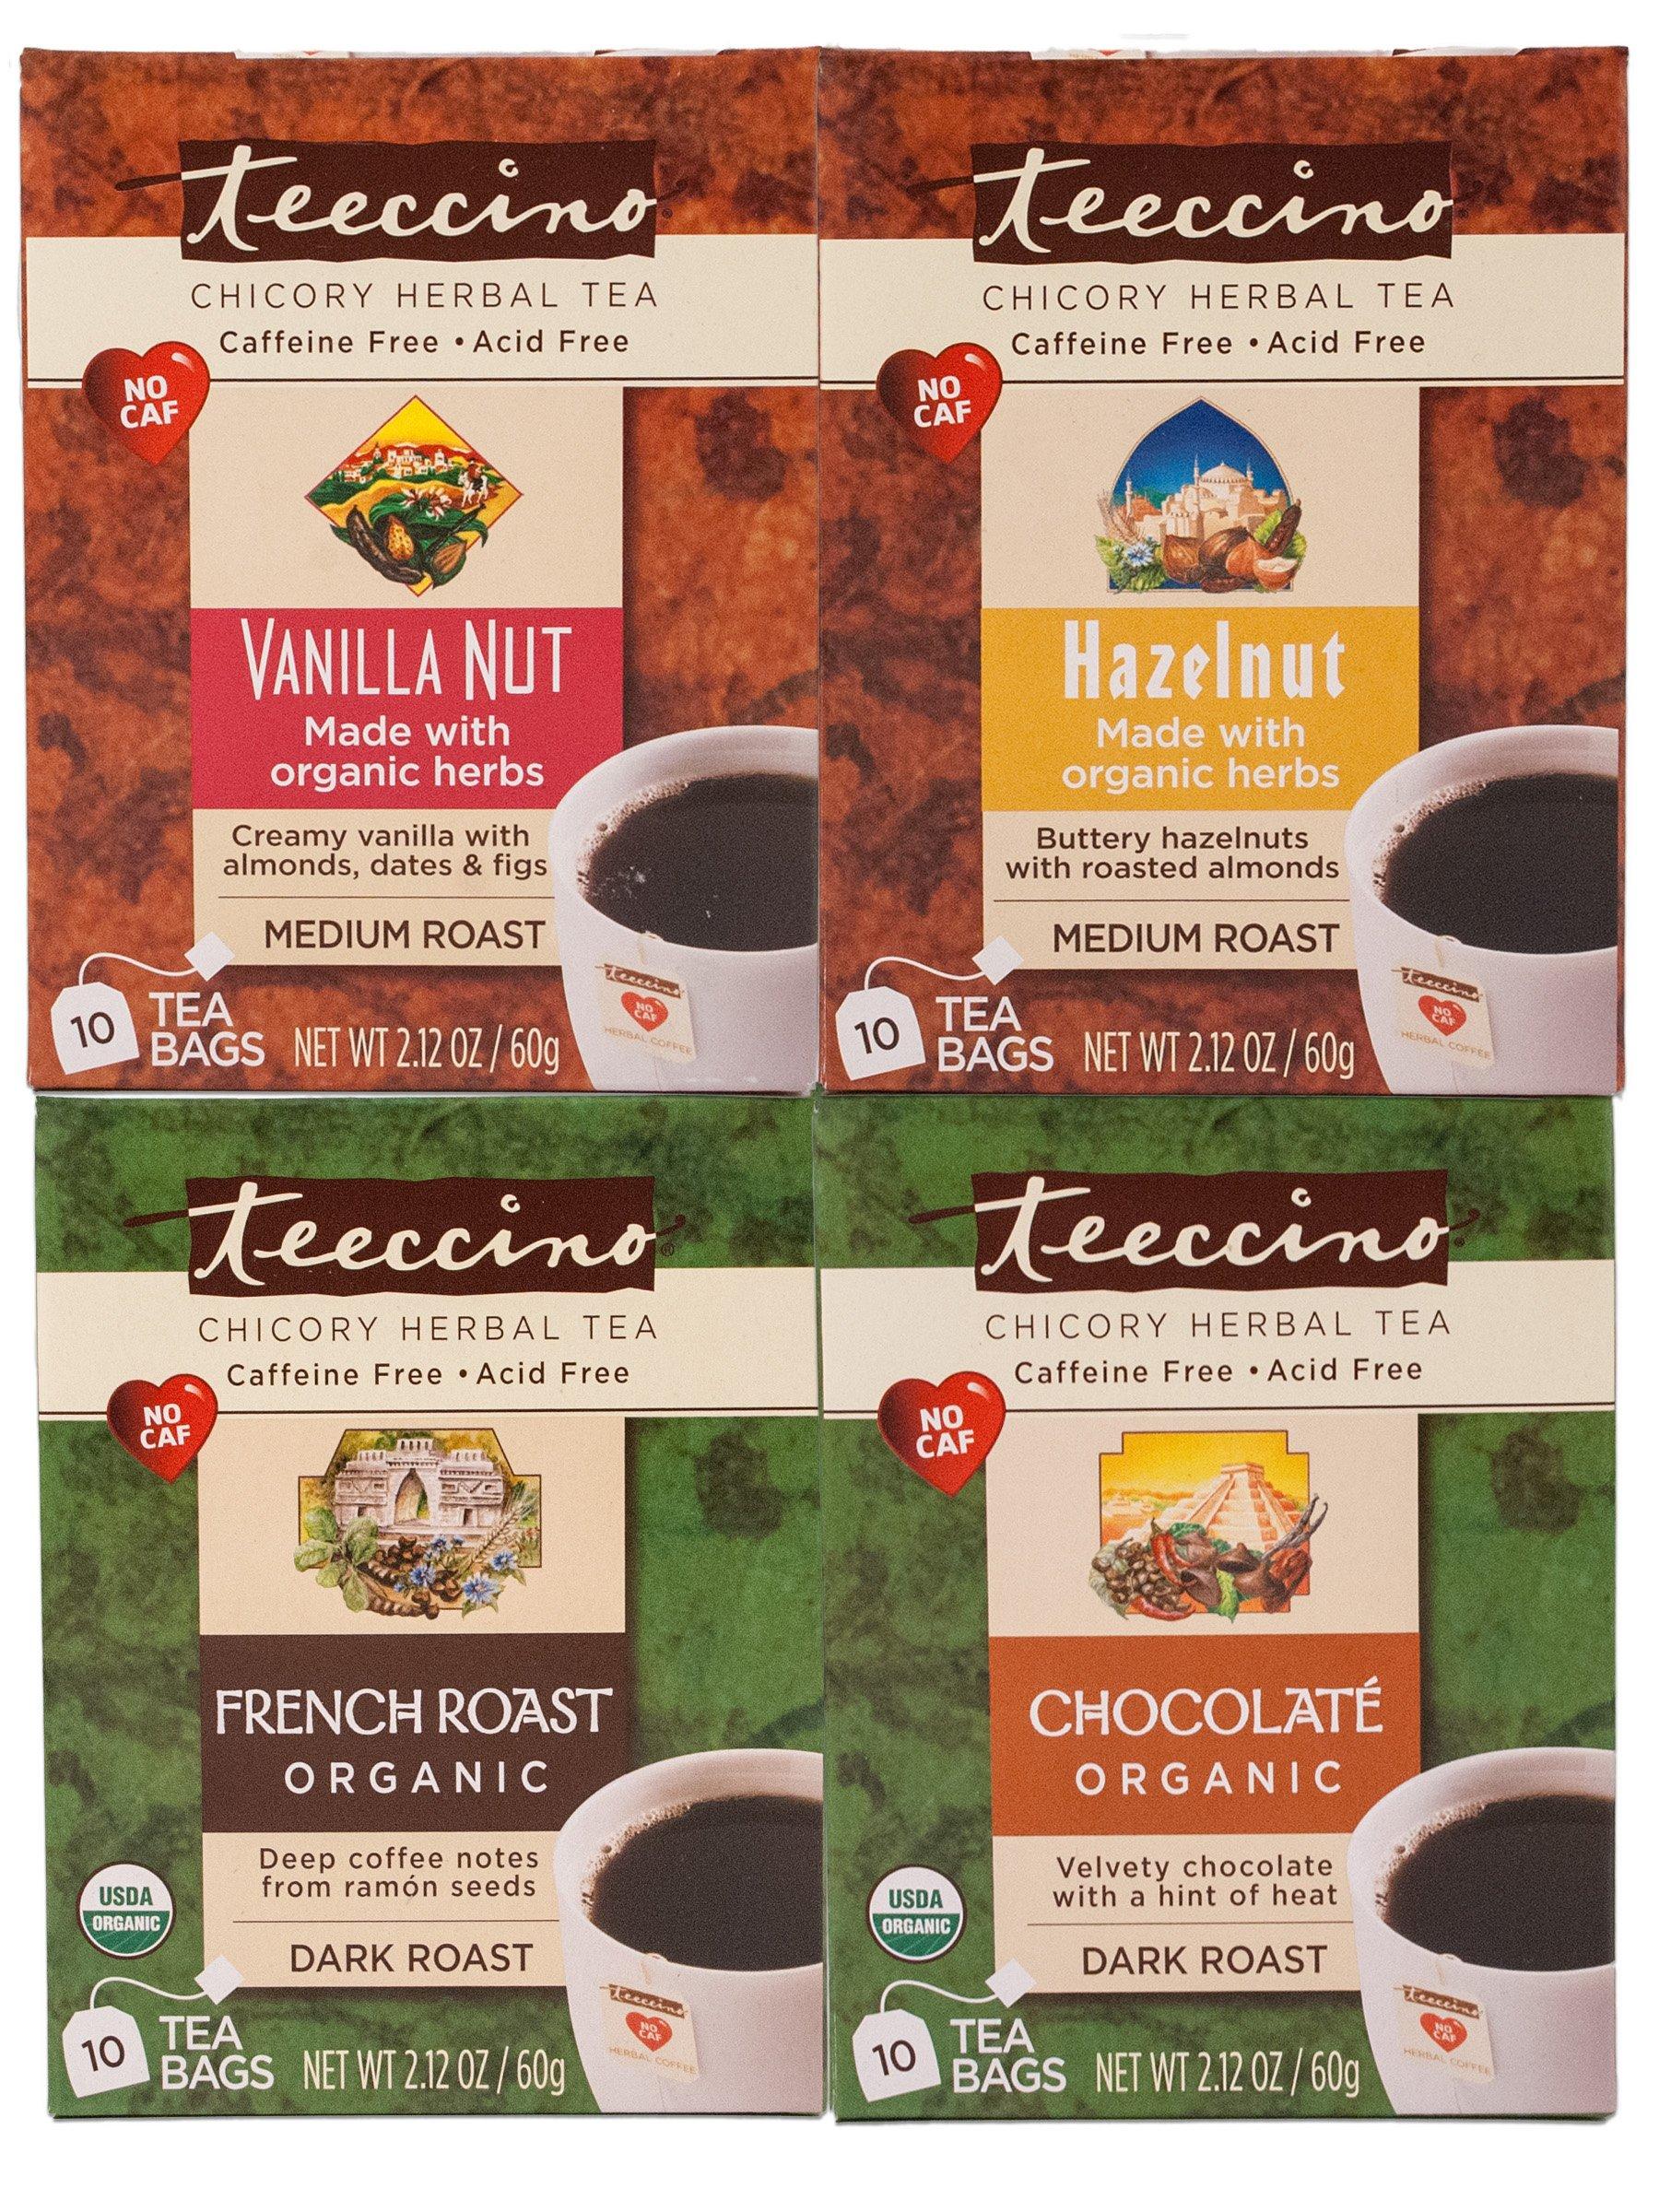 Teeccino Coffee Variety Pack (Vanilla Nut, Hazelnut, Chocolaté, French Roast) Chicory Herbal Tea Bags, Caffeine Free, Acid Free, 10 Count (Pack of 4)